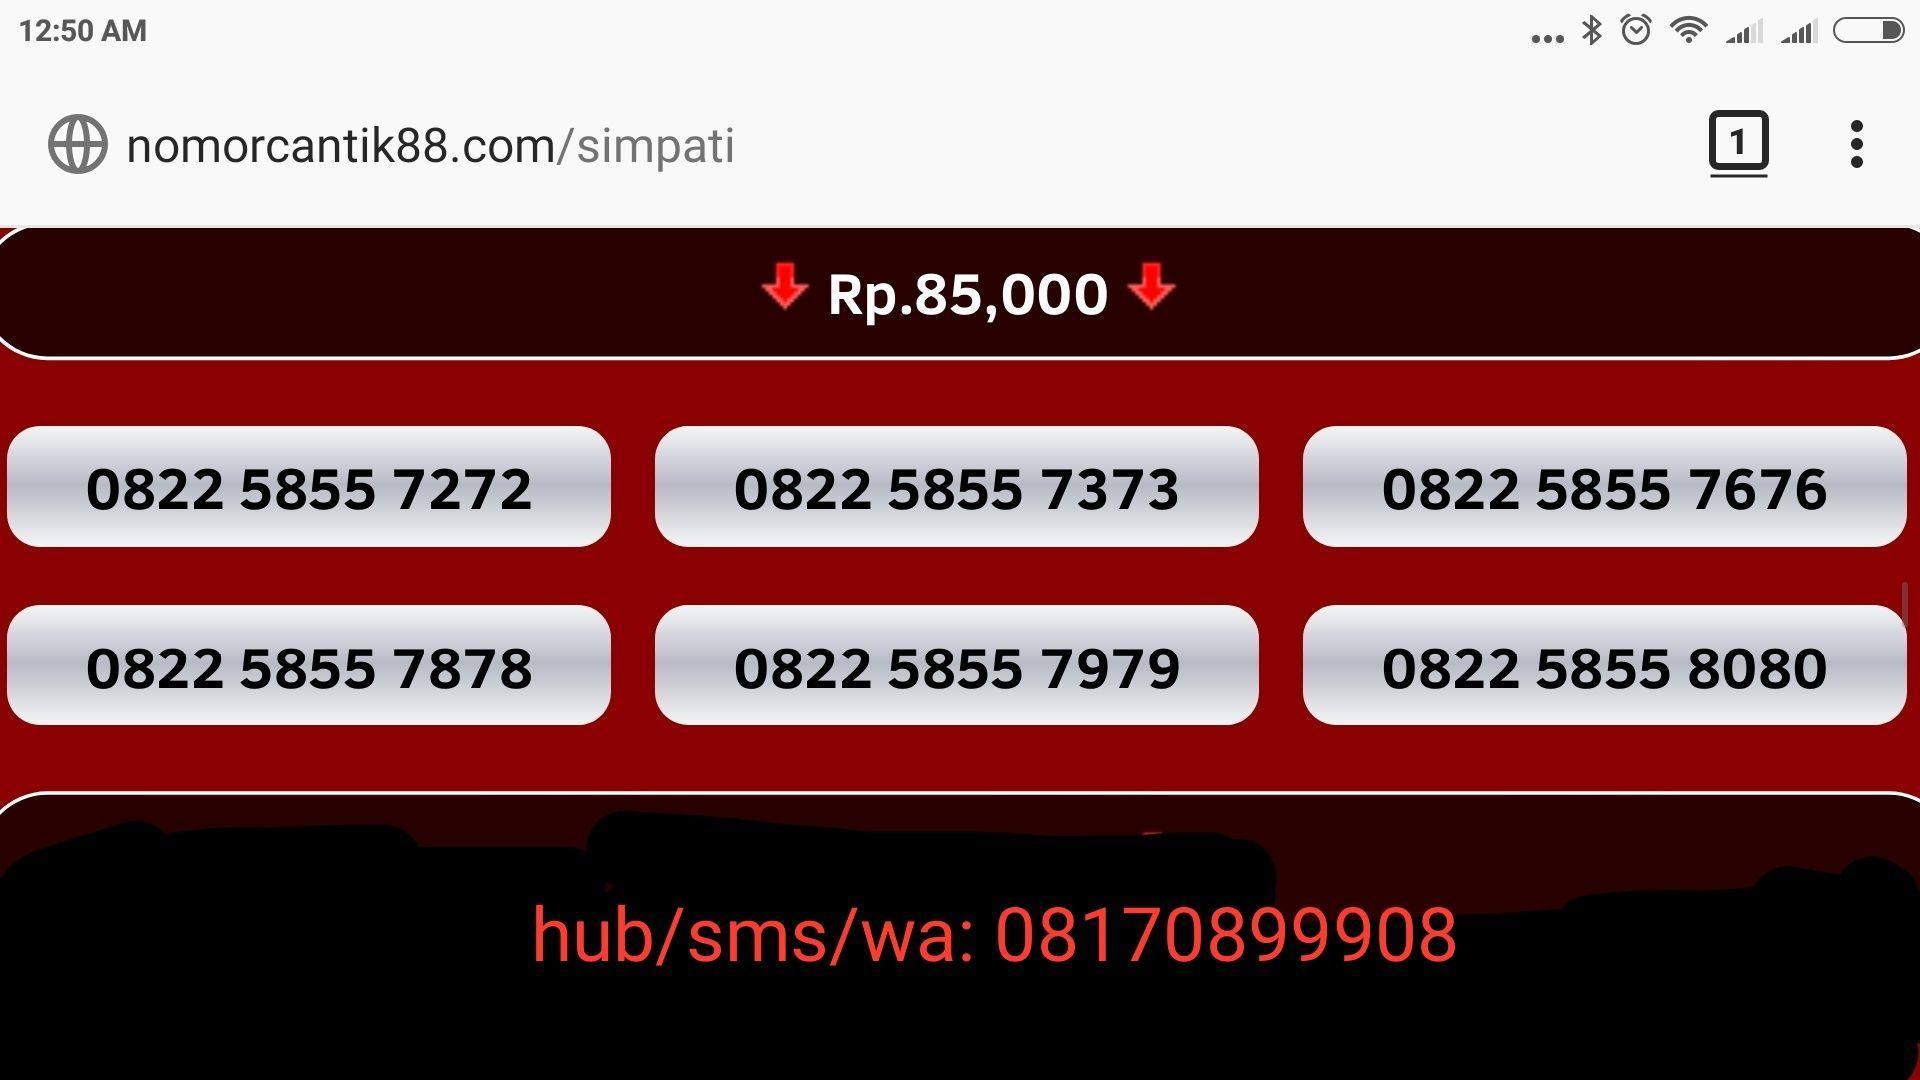 Kelebihan Kartu Perdana Xl Upgrade 3g Ke 4g Nomer Terkini Daftar Axis Nomor Cantik Simpati Telkomsel Nocan Gsm Murah Hoki Prabayar Internet Nano